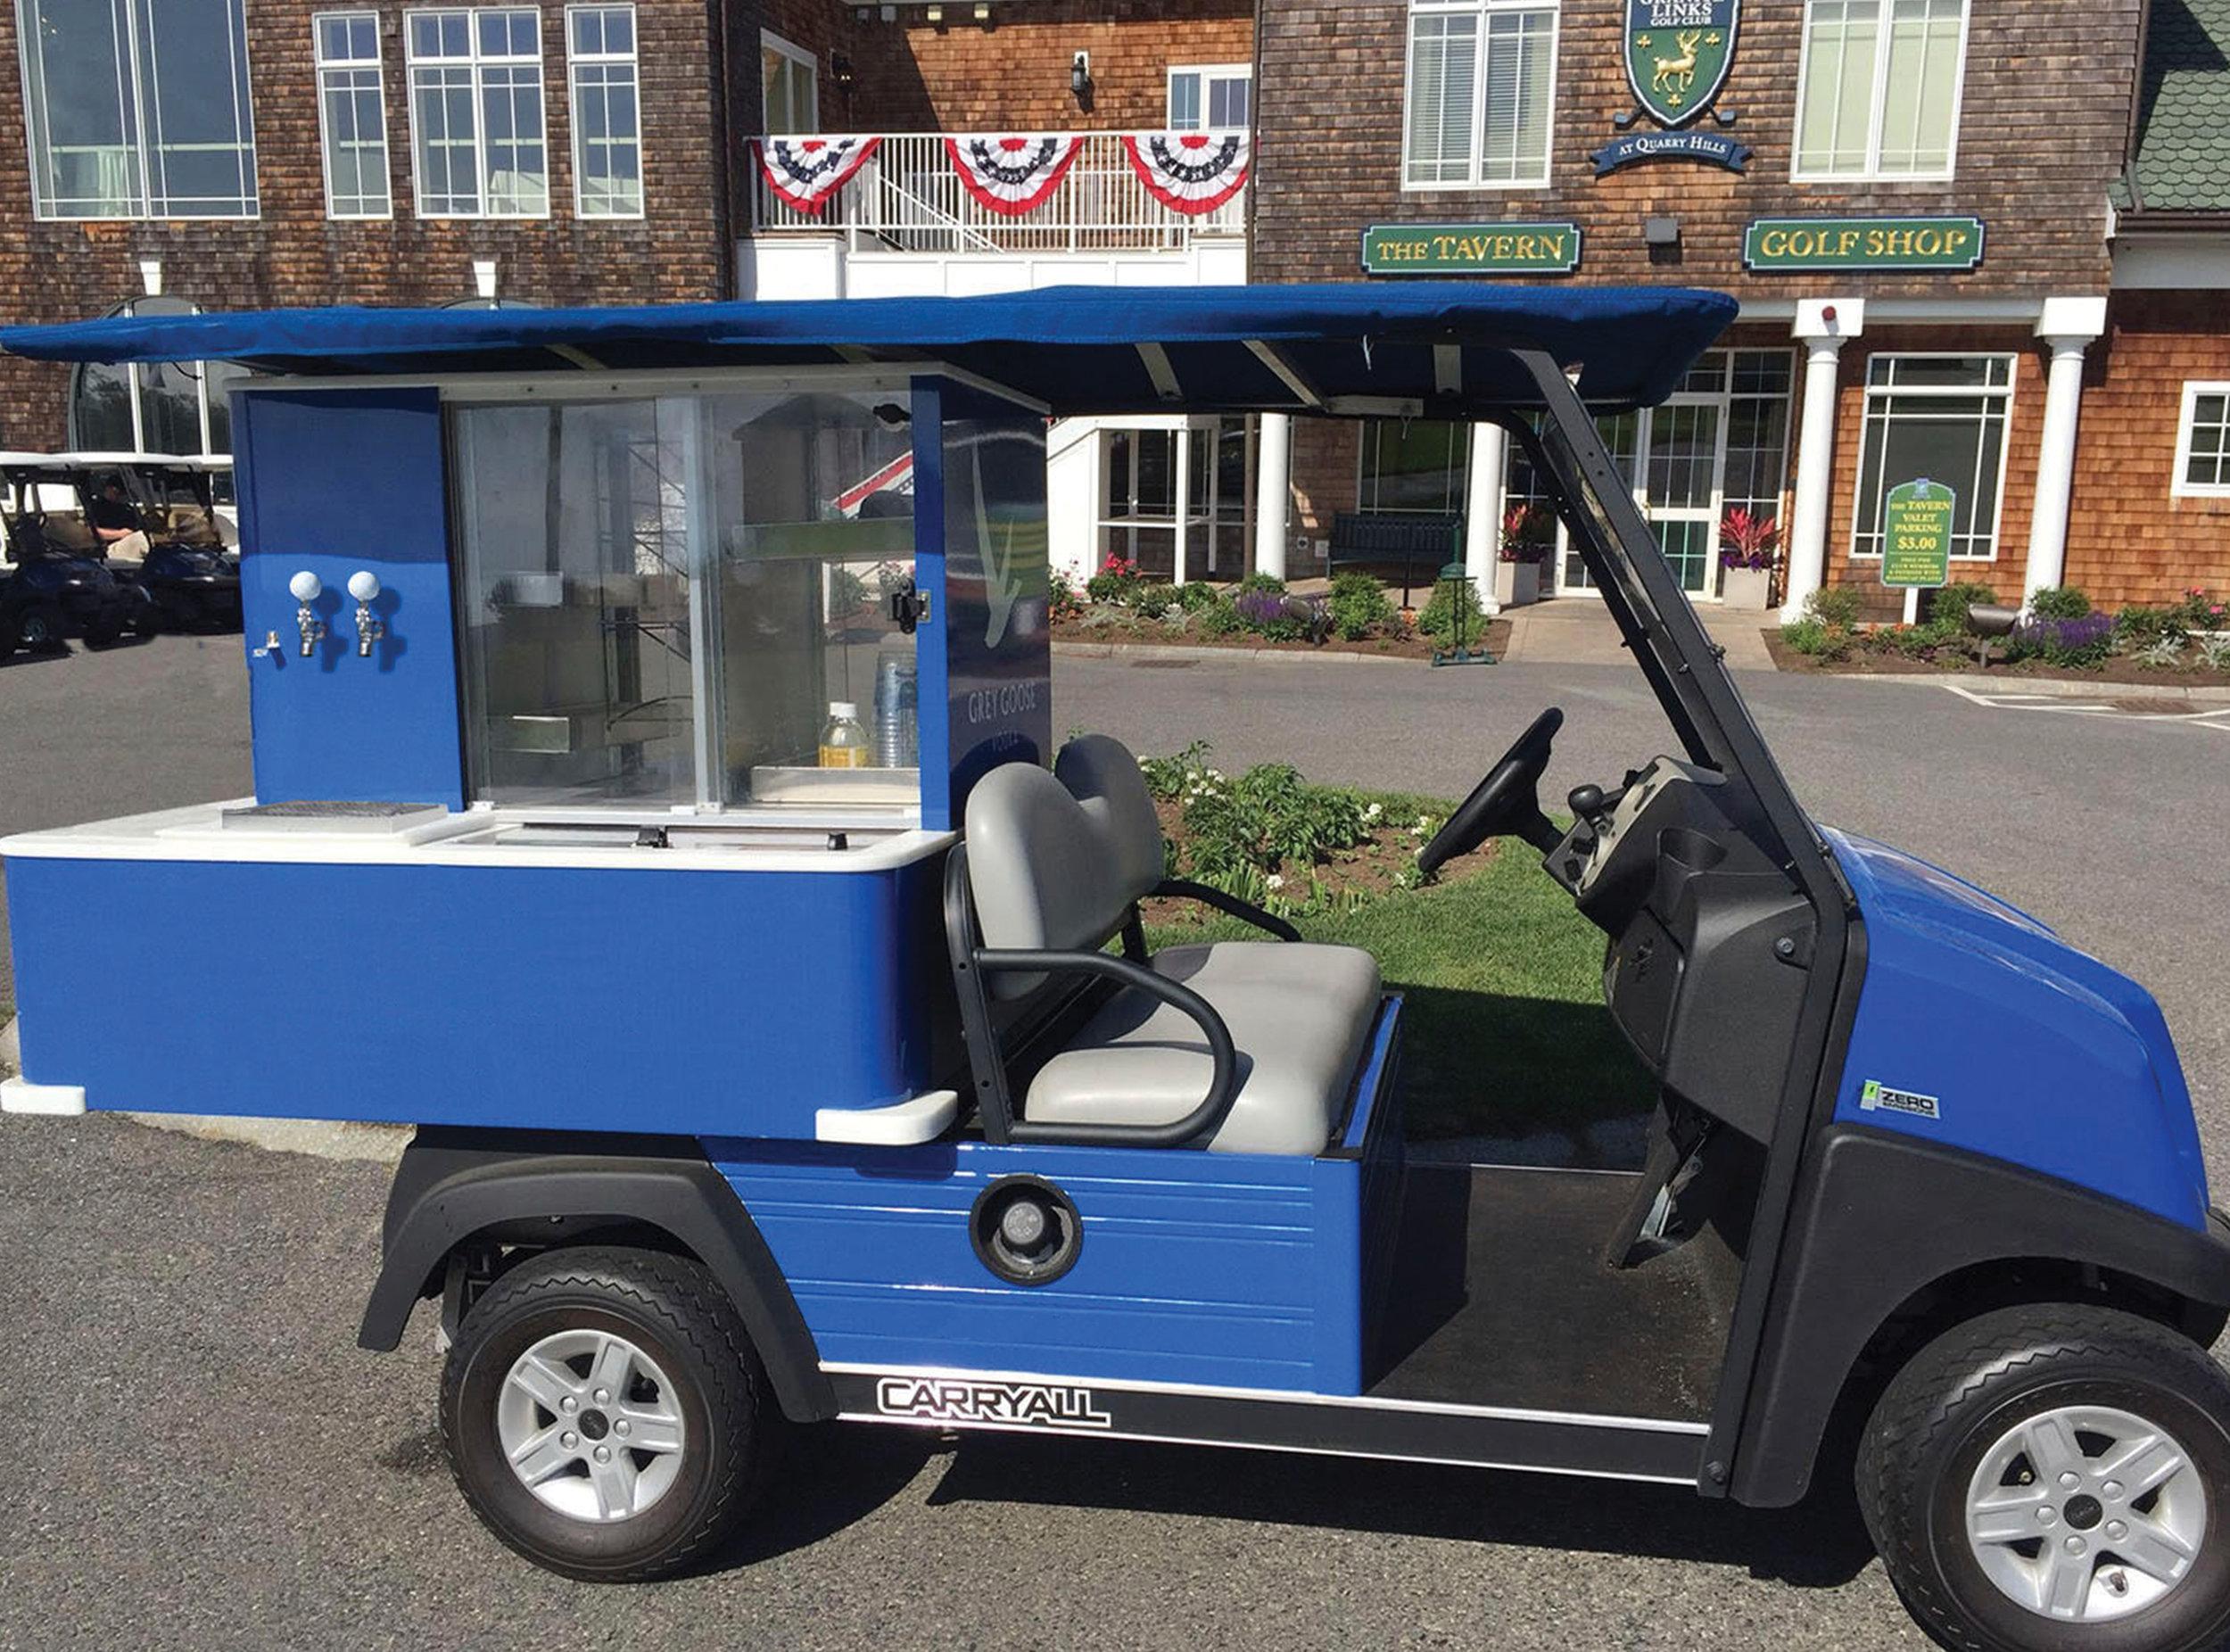 Golf-cart-on-course-+Tee-Box-blue-2.jpg